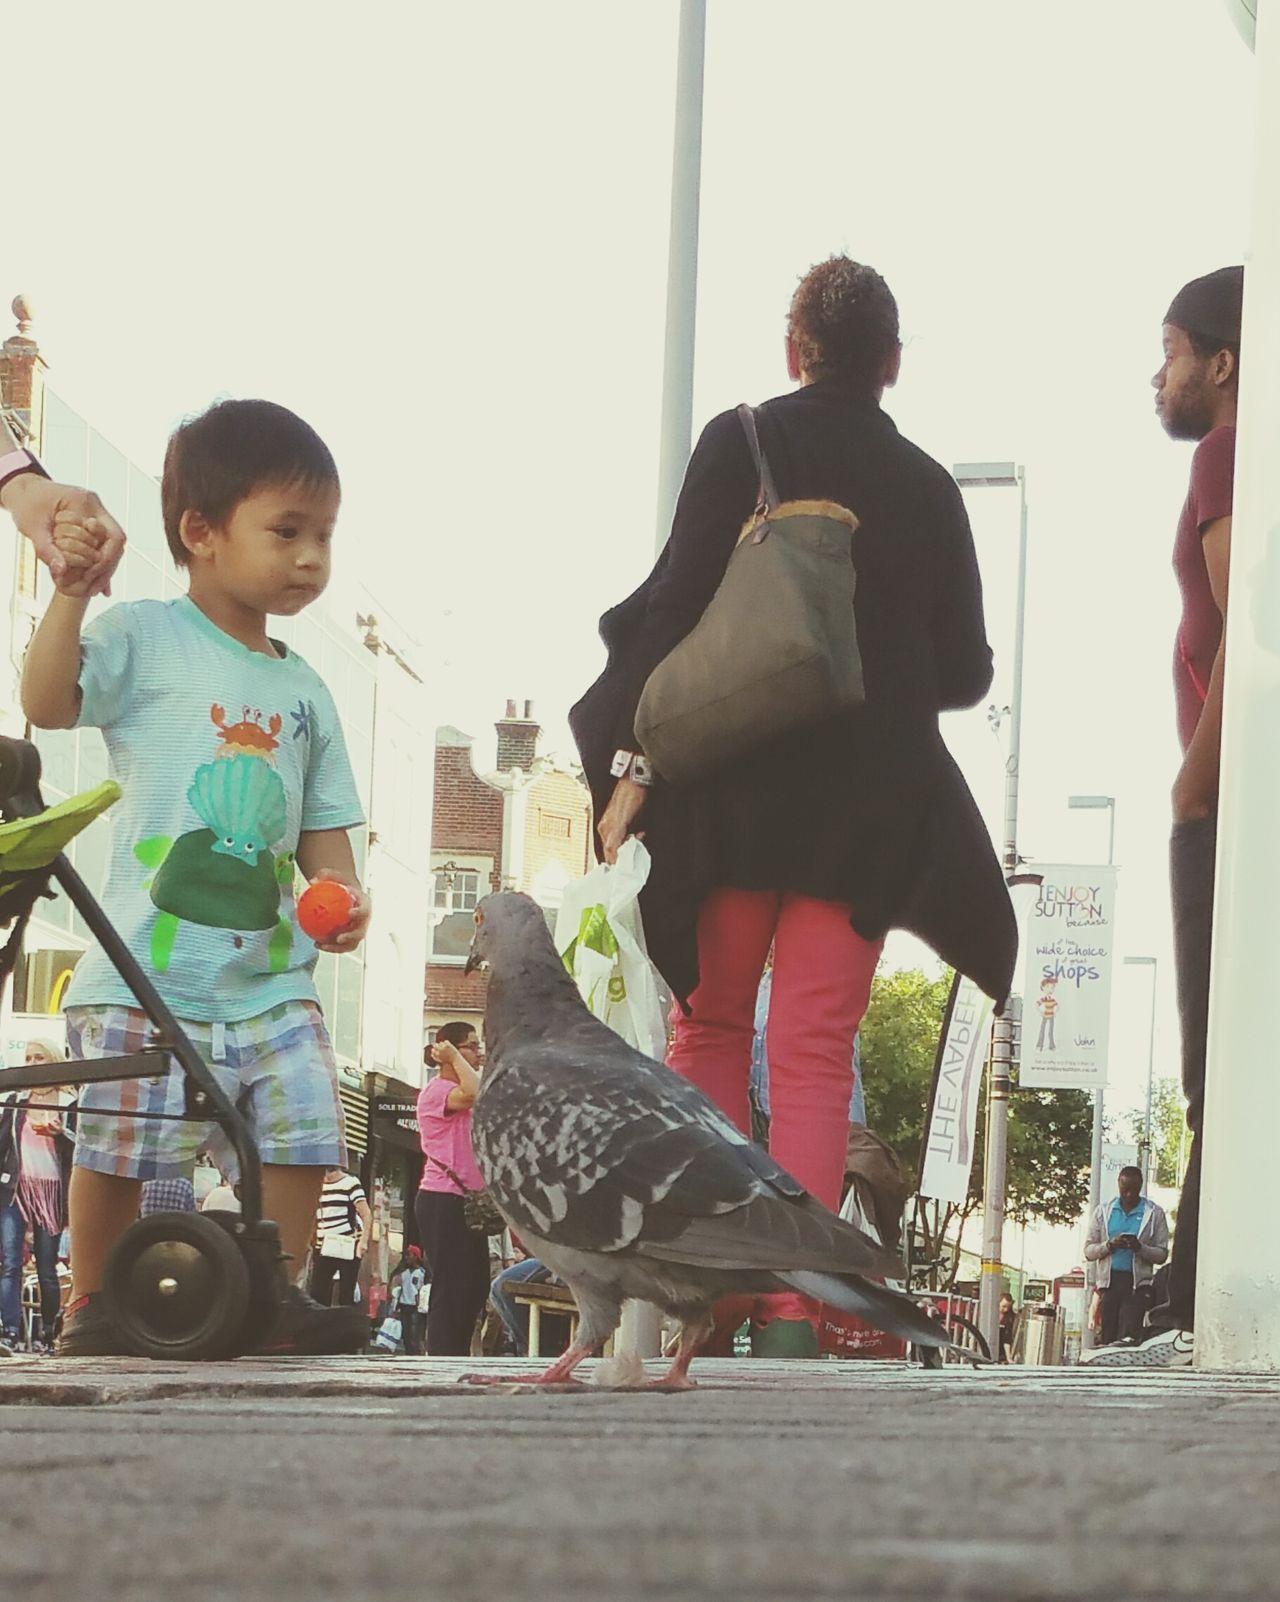 Streetlevel Street Photography Pidgeon